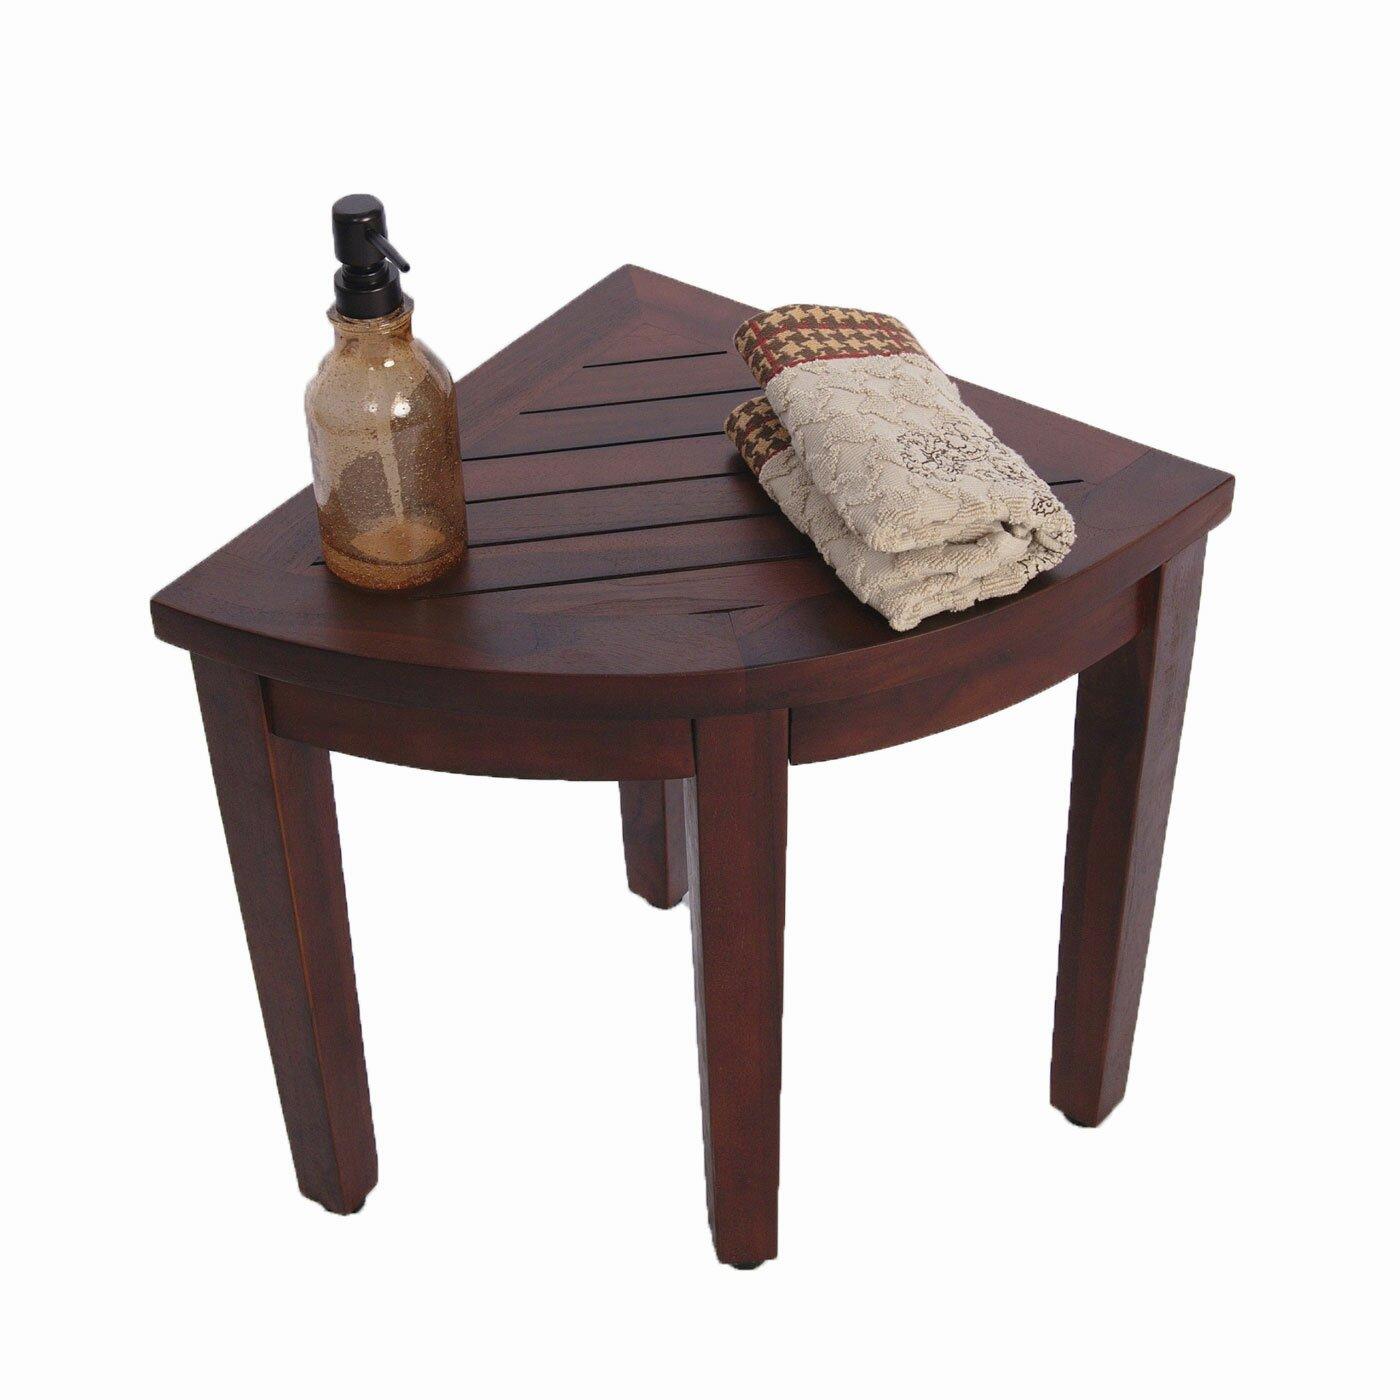 Decoteak Oasis Teak Corner Shower Seat Stool Chair Bench Reviews Wayfair